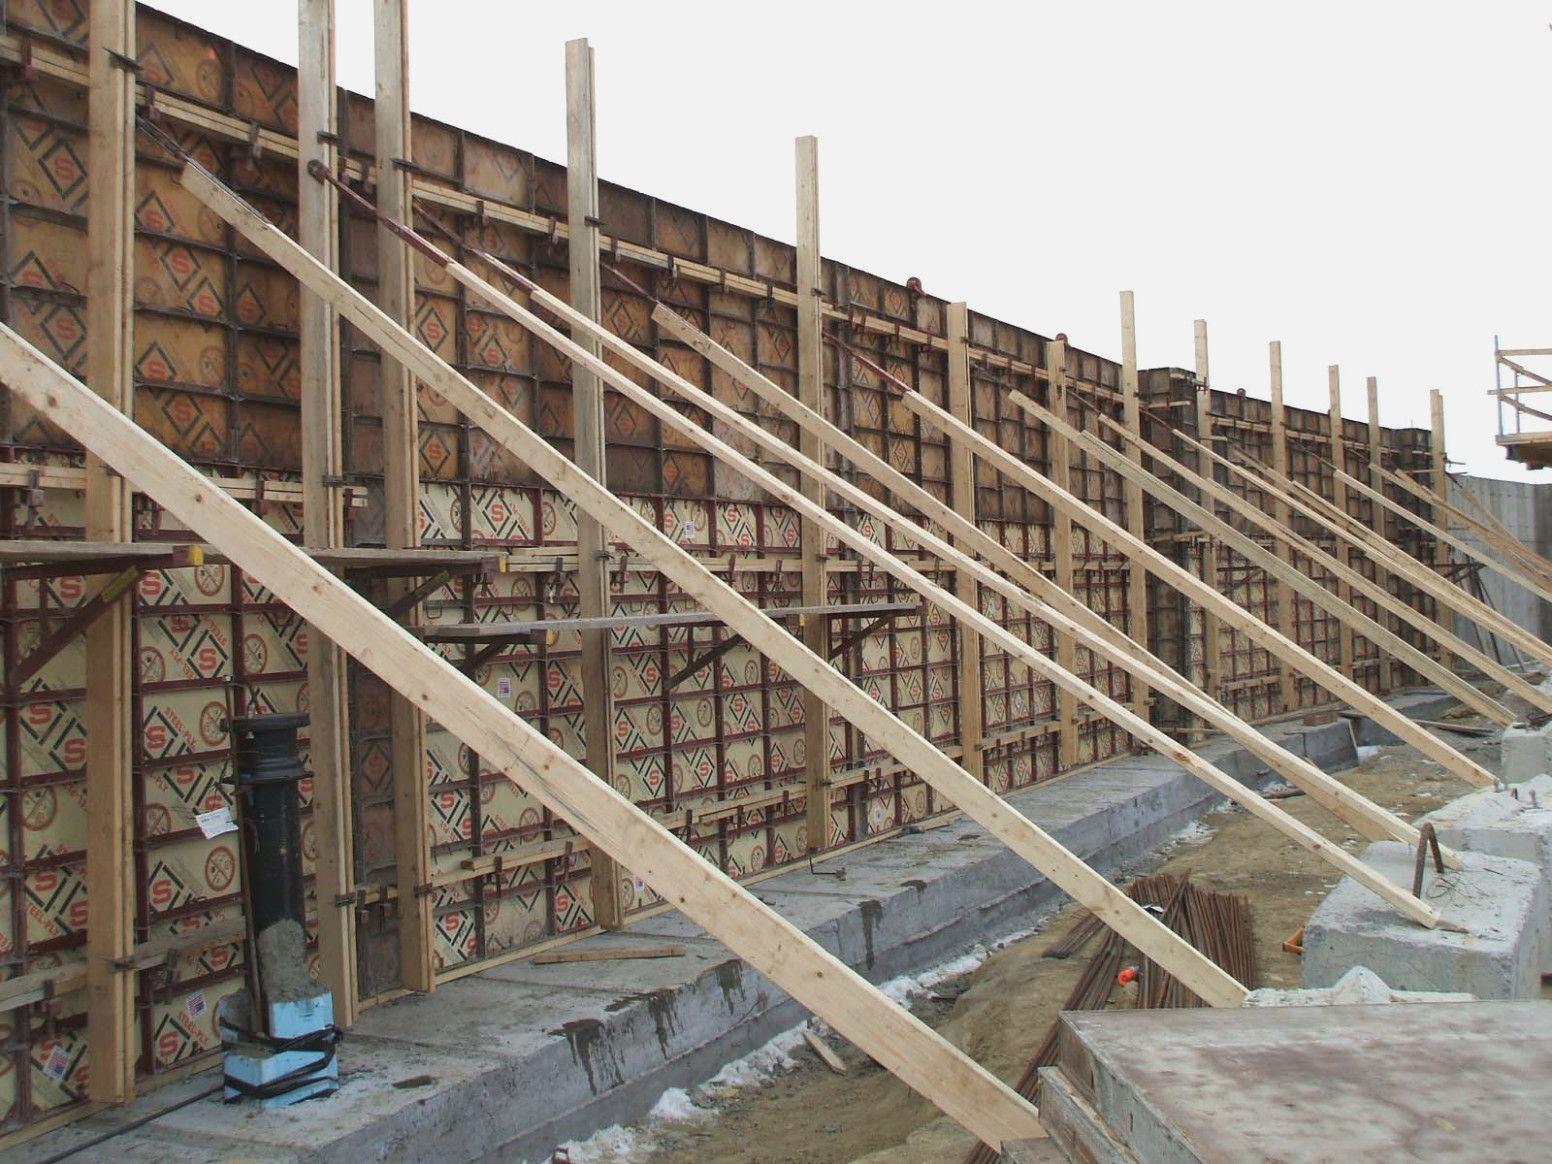 Concrete Form Tie Heart Impulsar In 2020 Concrete Concrete Forms Concrete Wall